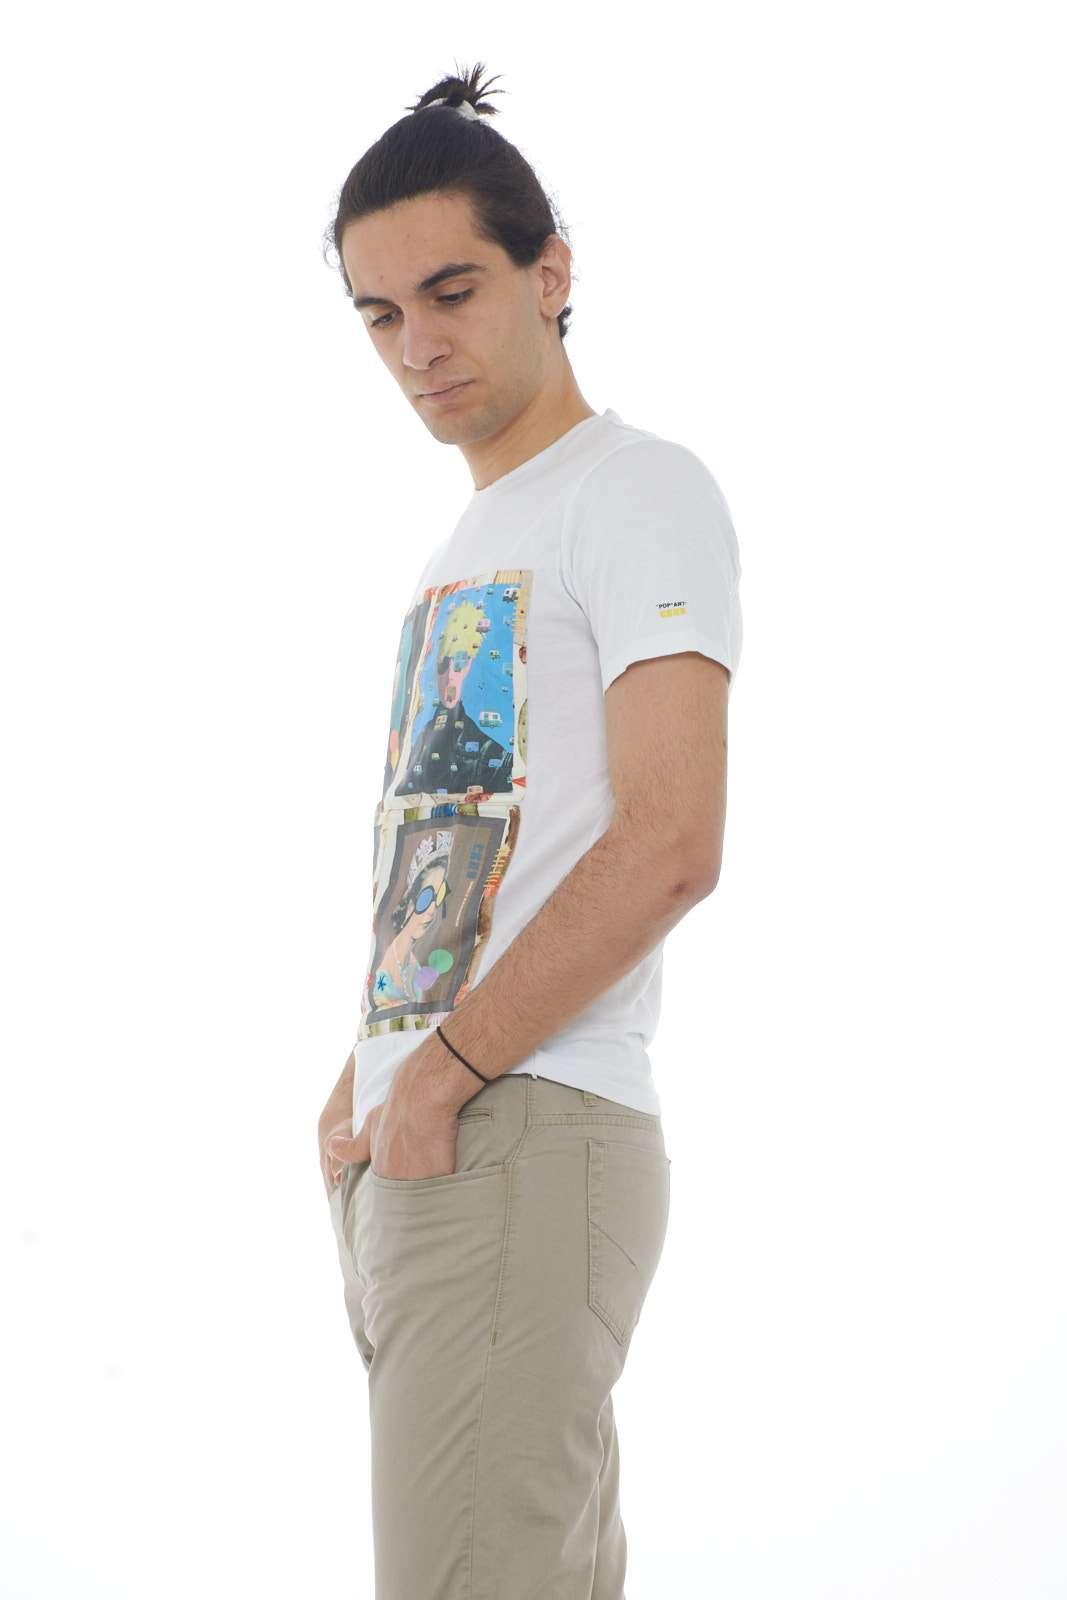 https://www.parmax.com/media/catalog/product/a/i/PE-outlet_parmax-t-shirt-uomo-Daniele-Alessandrini-M6870E6433900-B.jpg